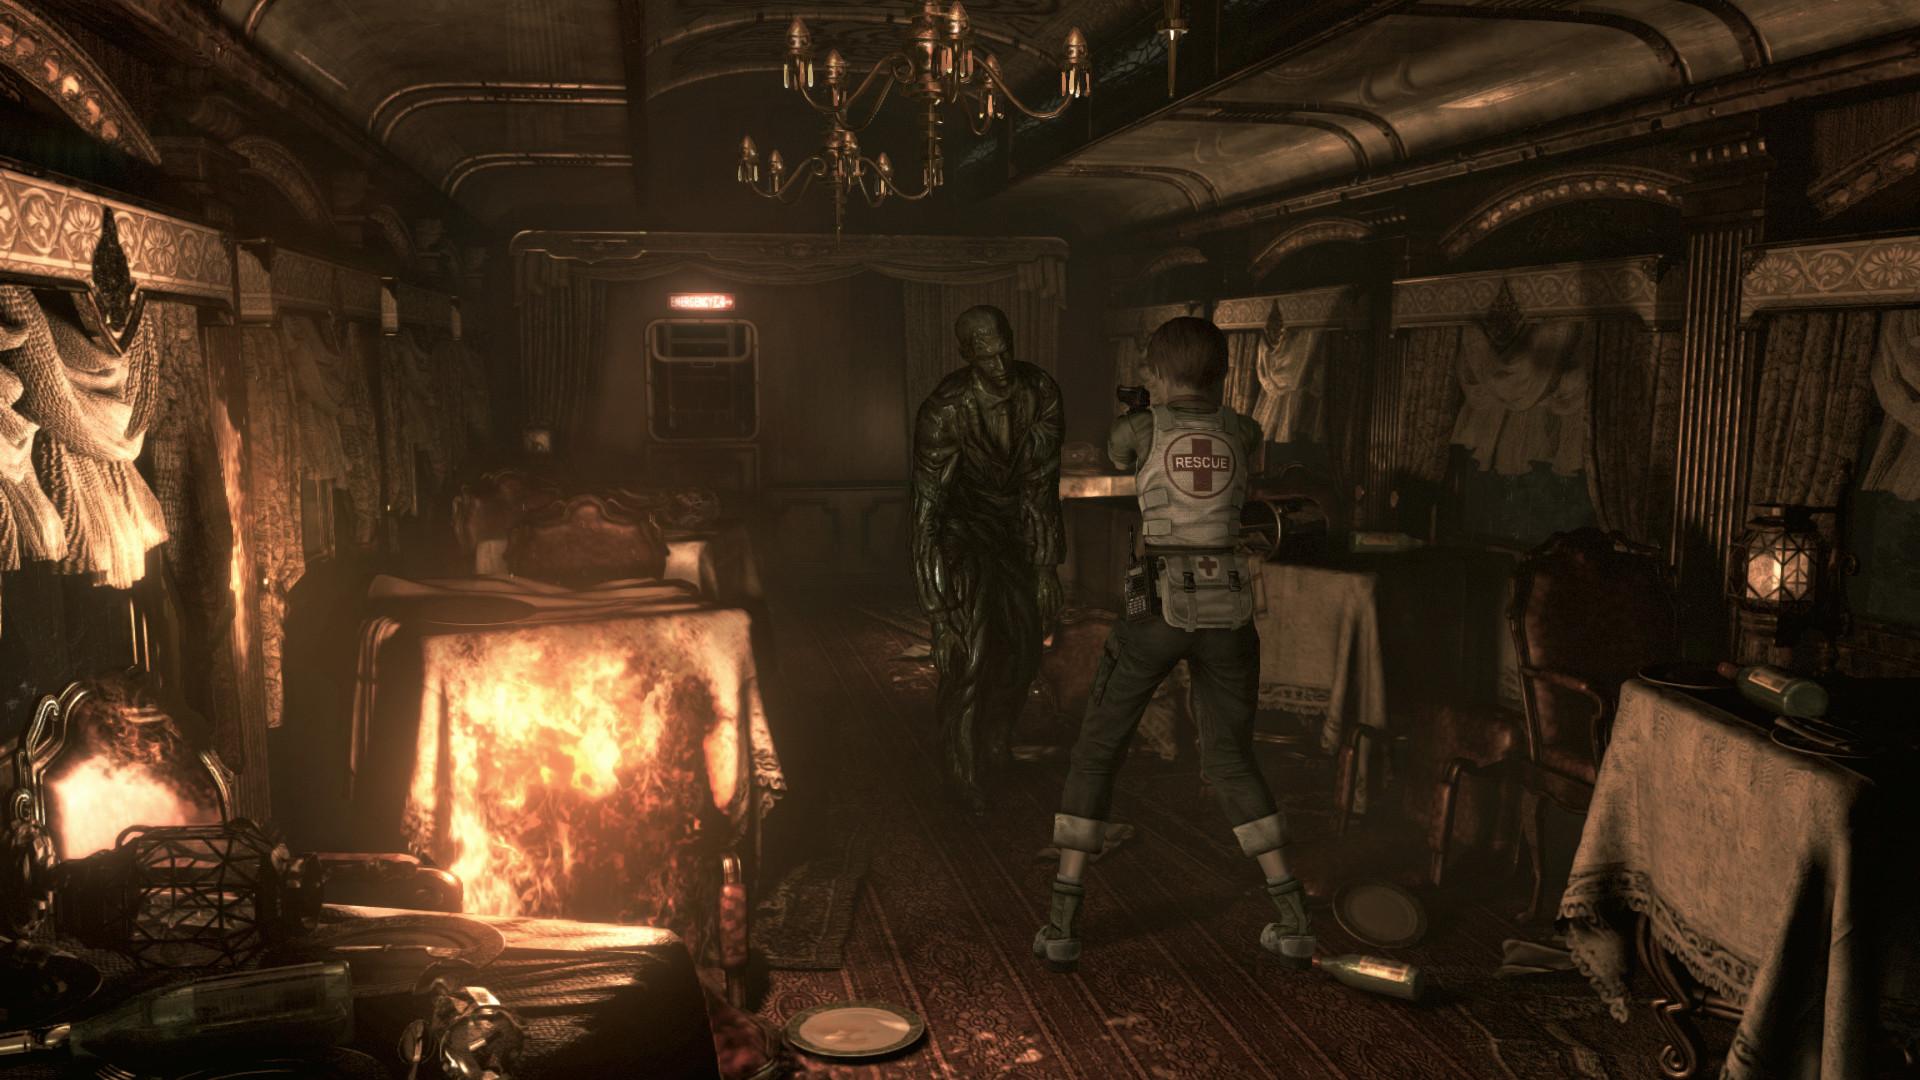 Resident Evil 0 Biohazard Hd Remaster On Steam Revelations Ps4 Region 3 English